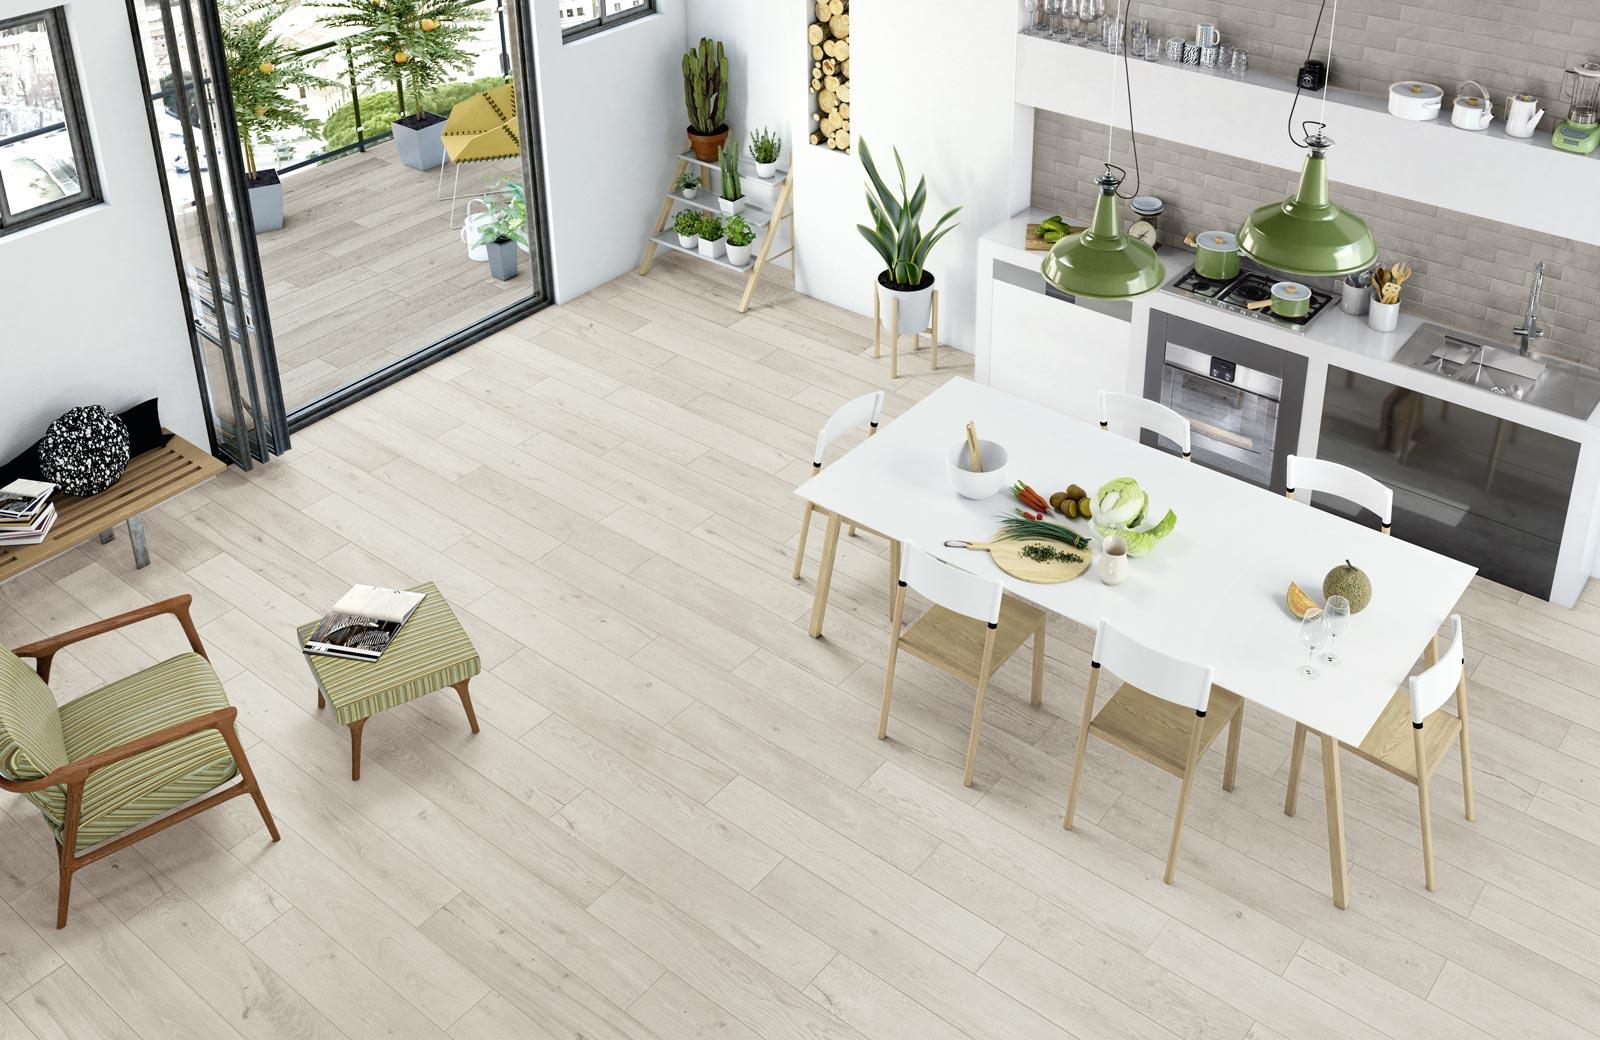 Woodspirit wood look stoneware ragno woodspirit ceramic tiles ragno6553 doublecrazyfo Images